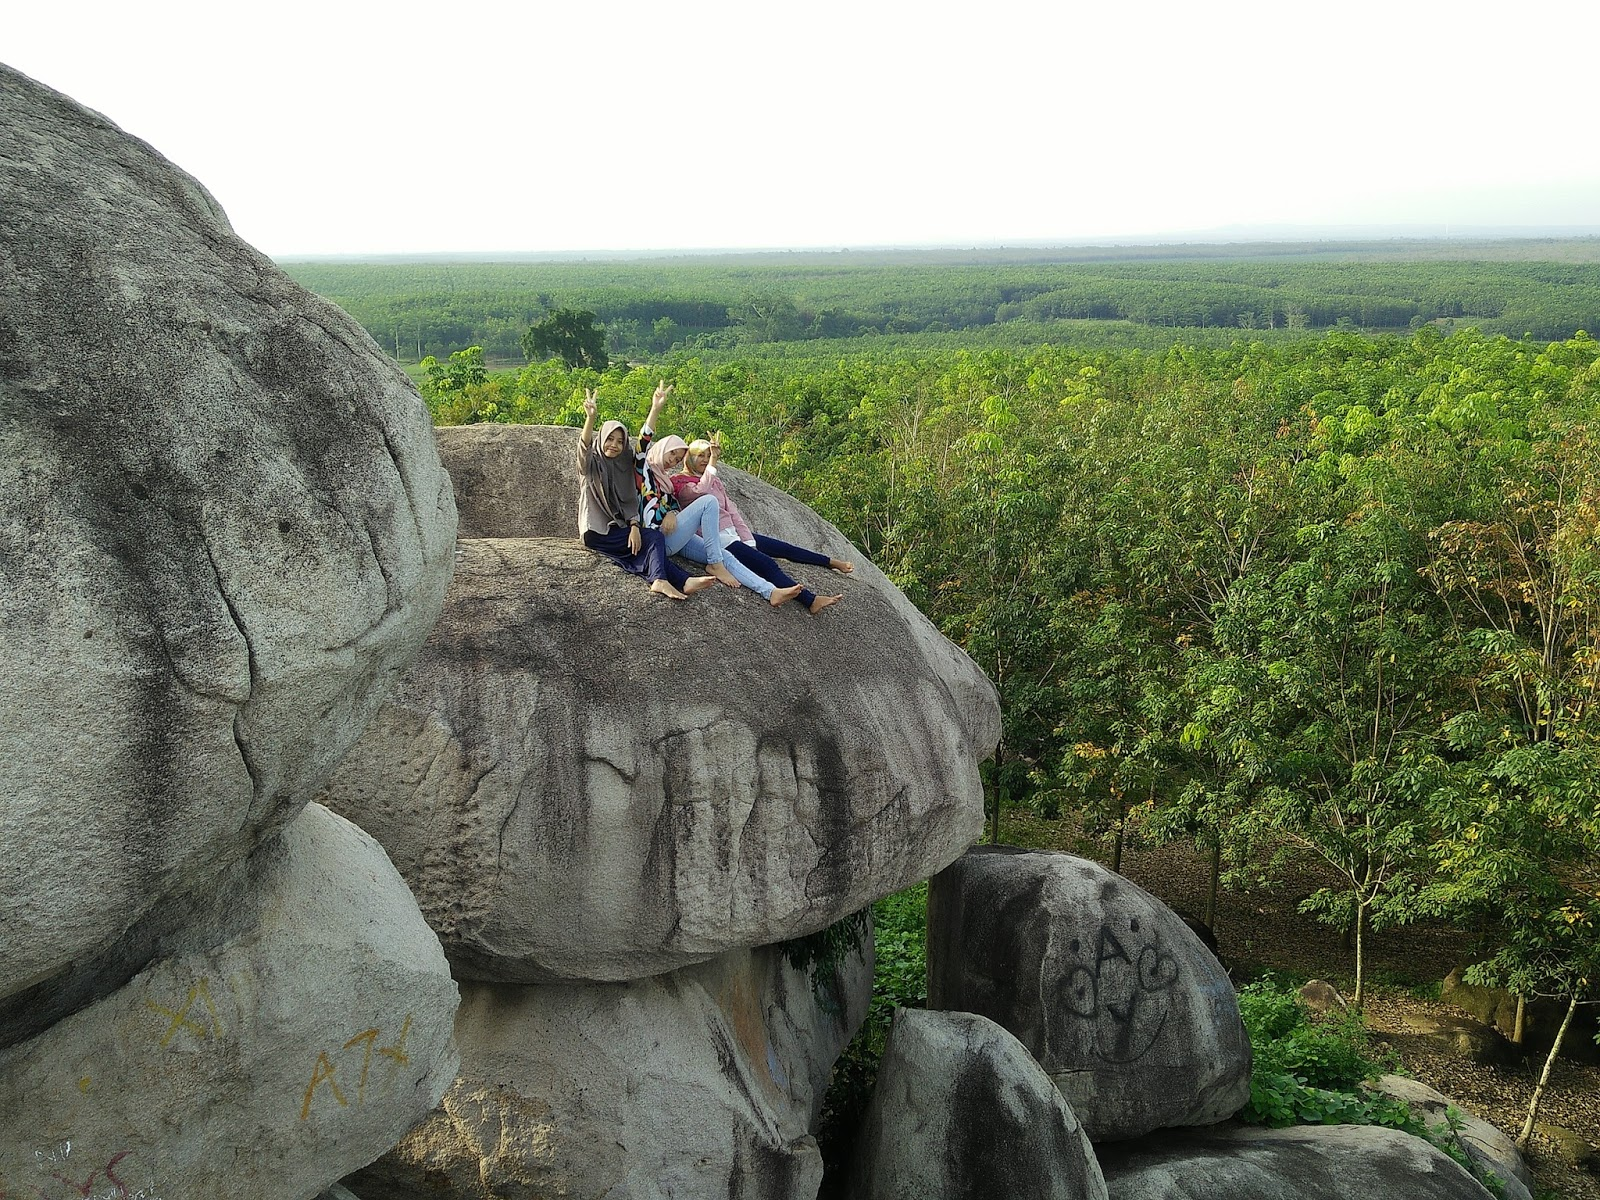 8 Taman Batu Granit Tanjung Bintang turisindo Diah Ayu NZ